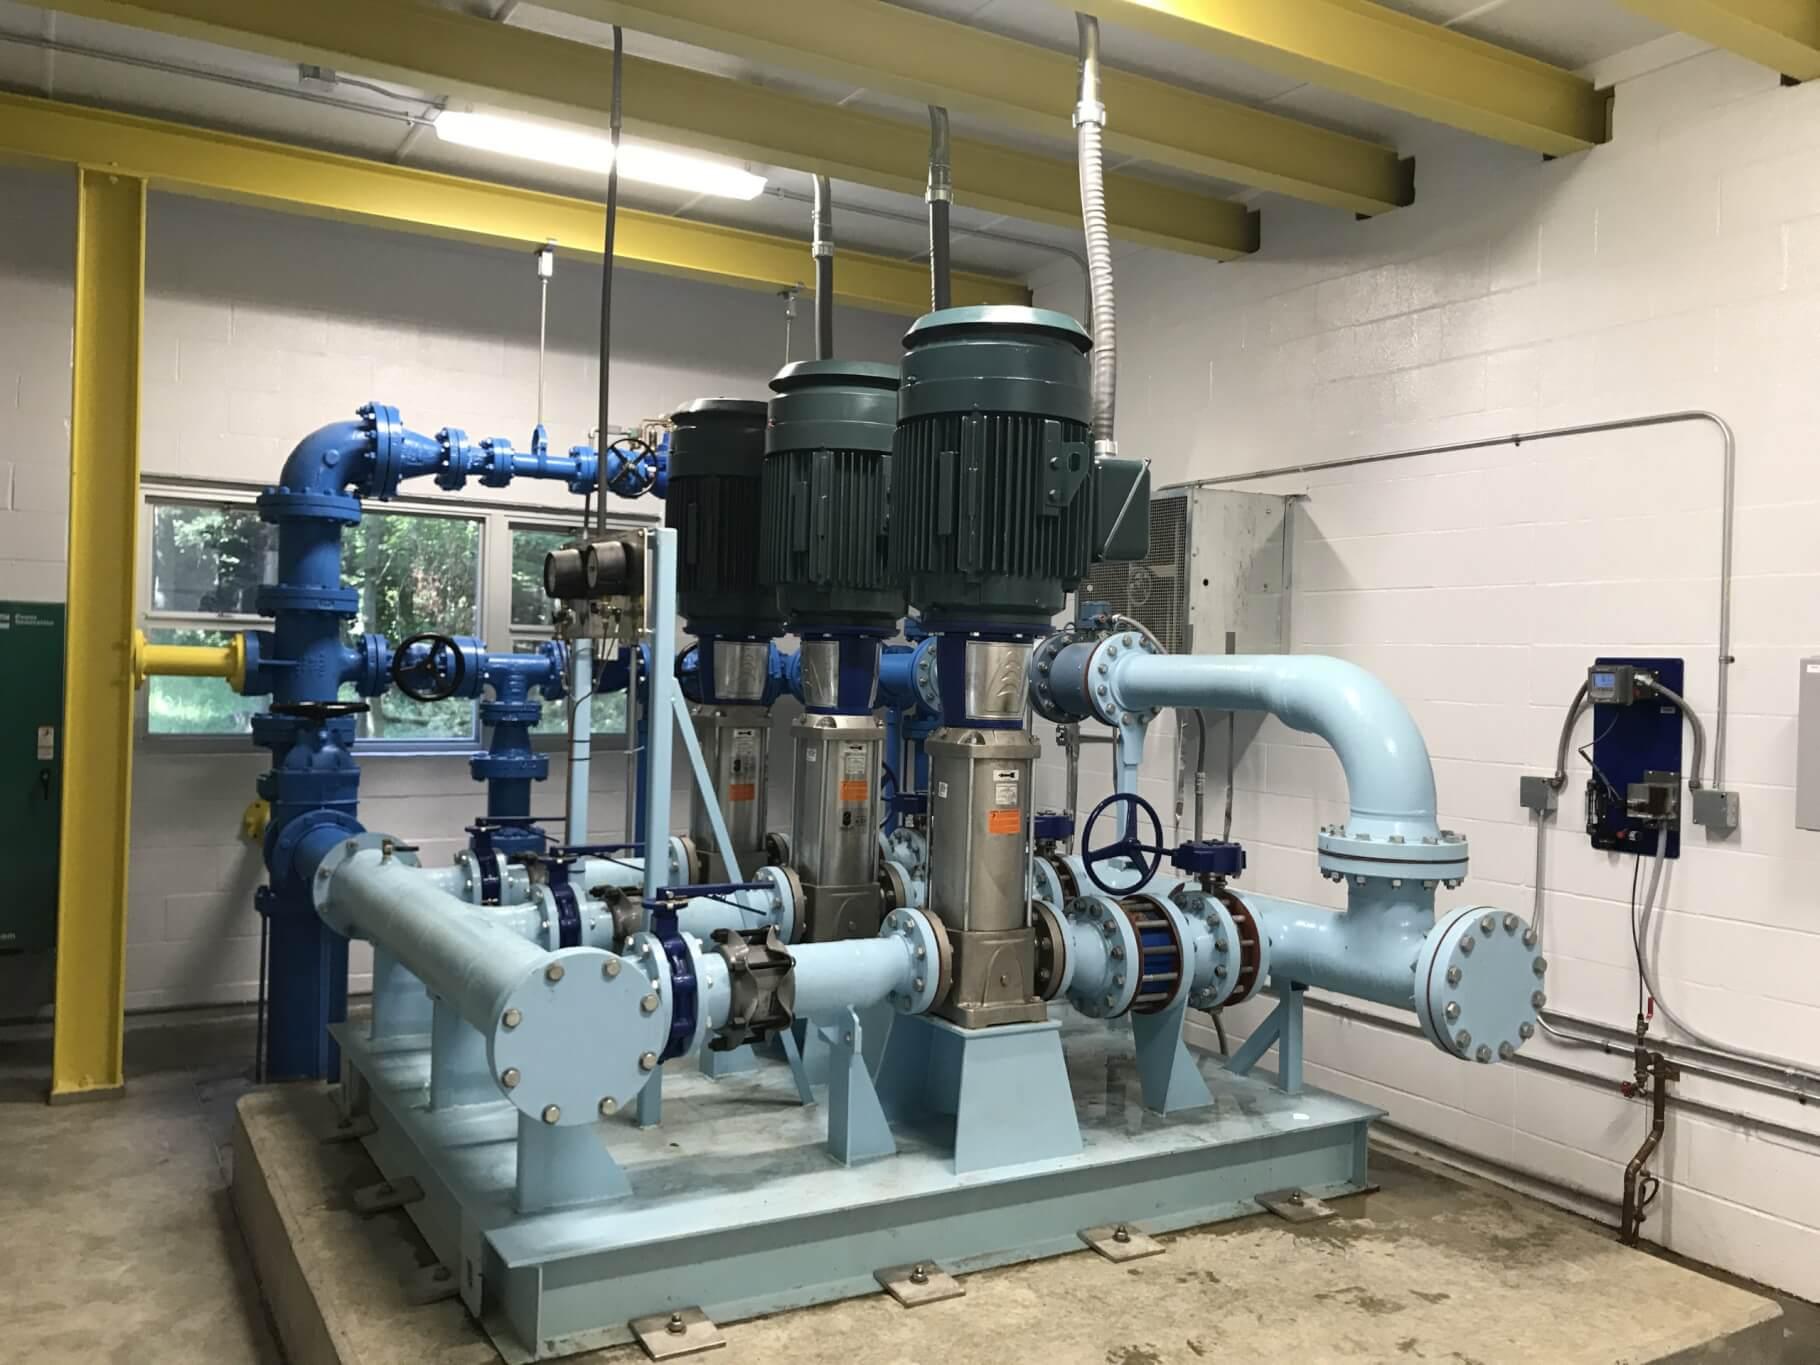 jadestone-engineering-Village of Trumansburg-well and water system improvements